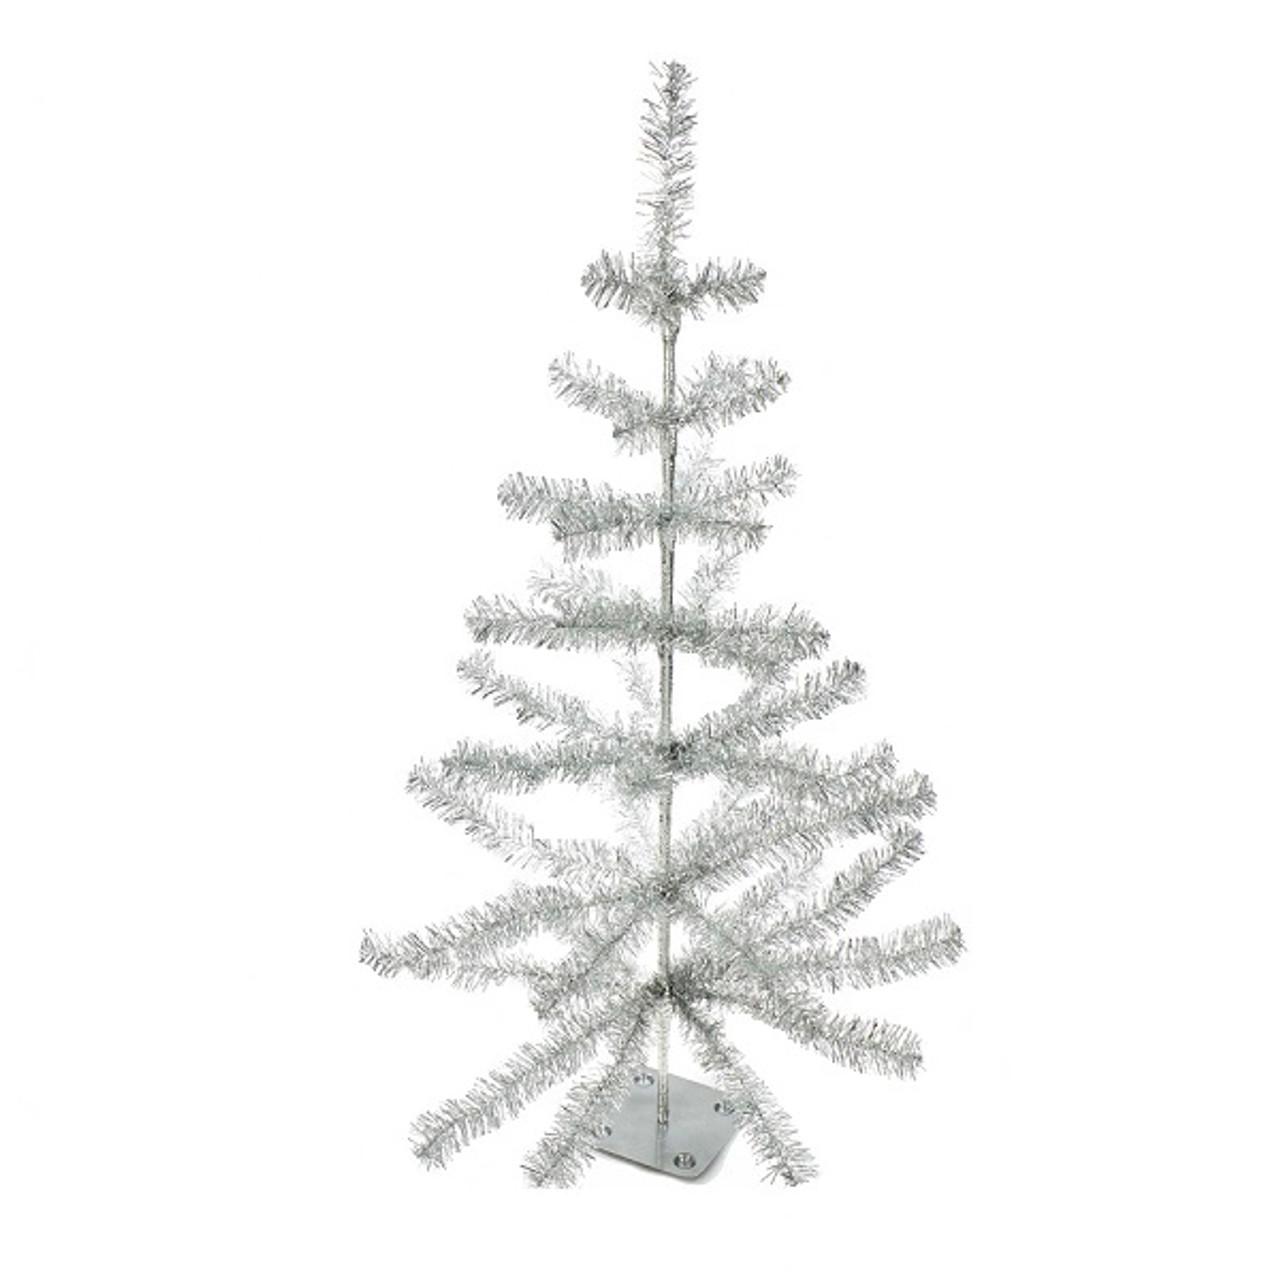 Large Pink Starburst Star Ceramic Christmas Tree Topper  VINTAGE Lights Bulbs